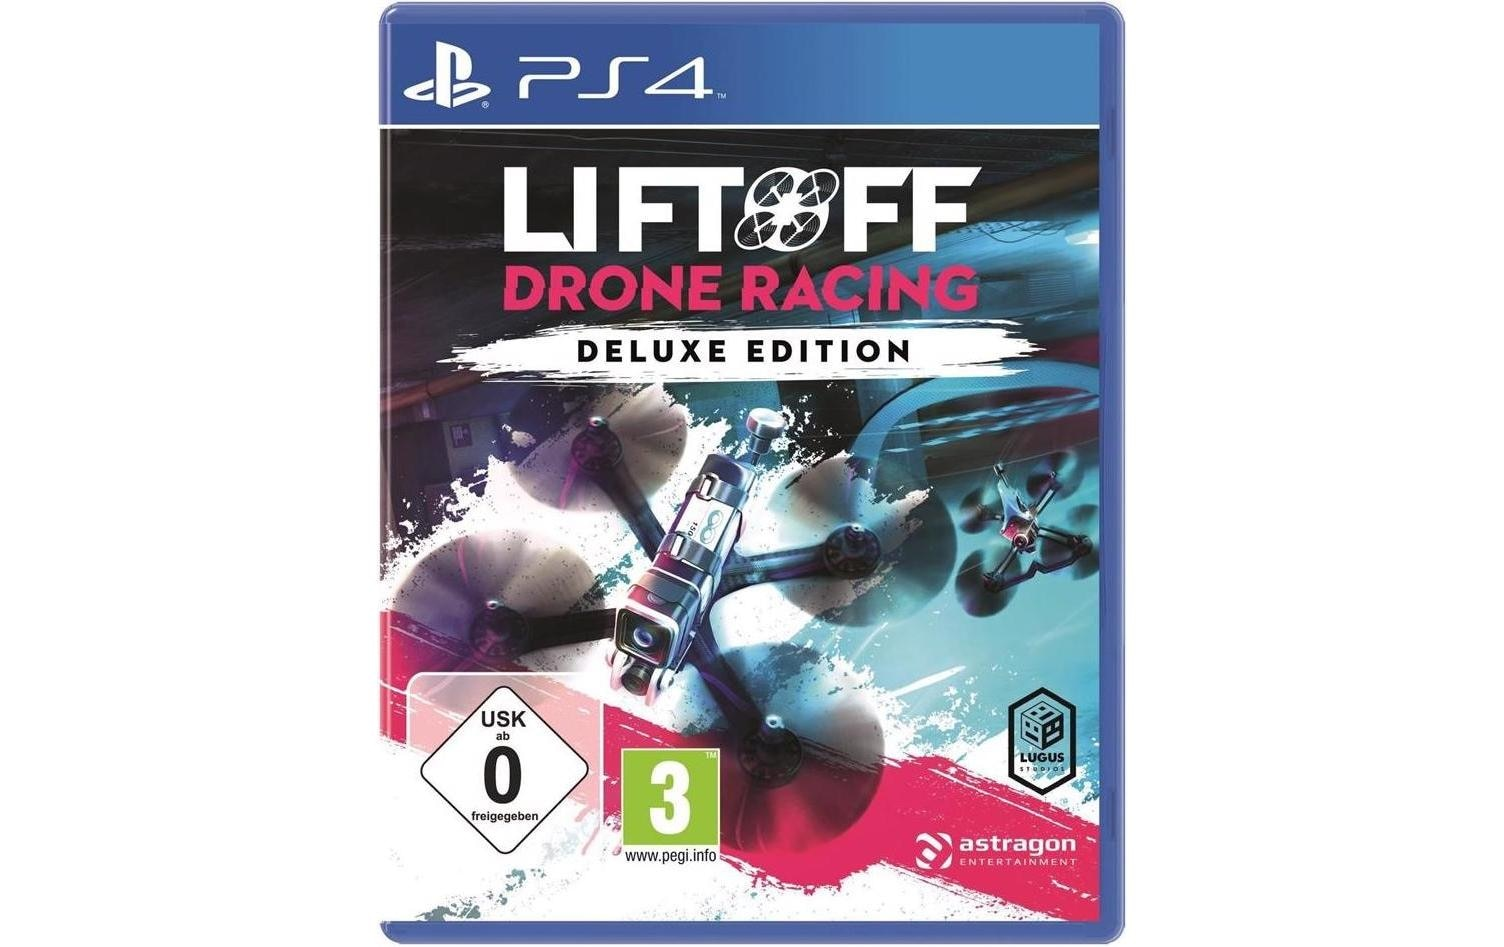 Image of Astragon Spiel »Drone Racing Deluxe Edition«, PlayStation 4, Special Edition